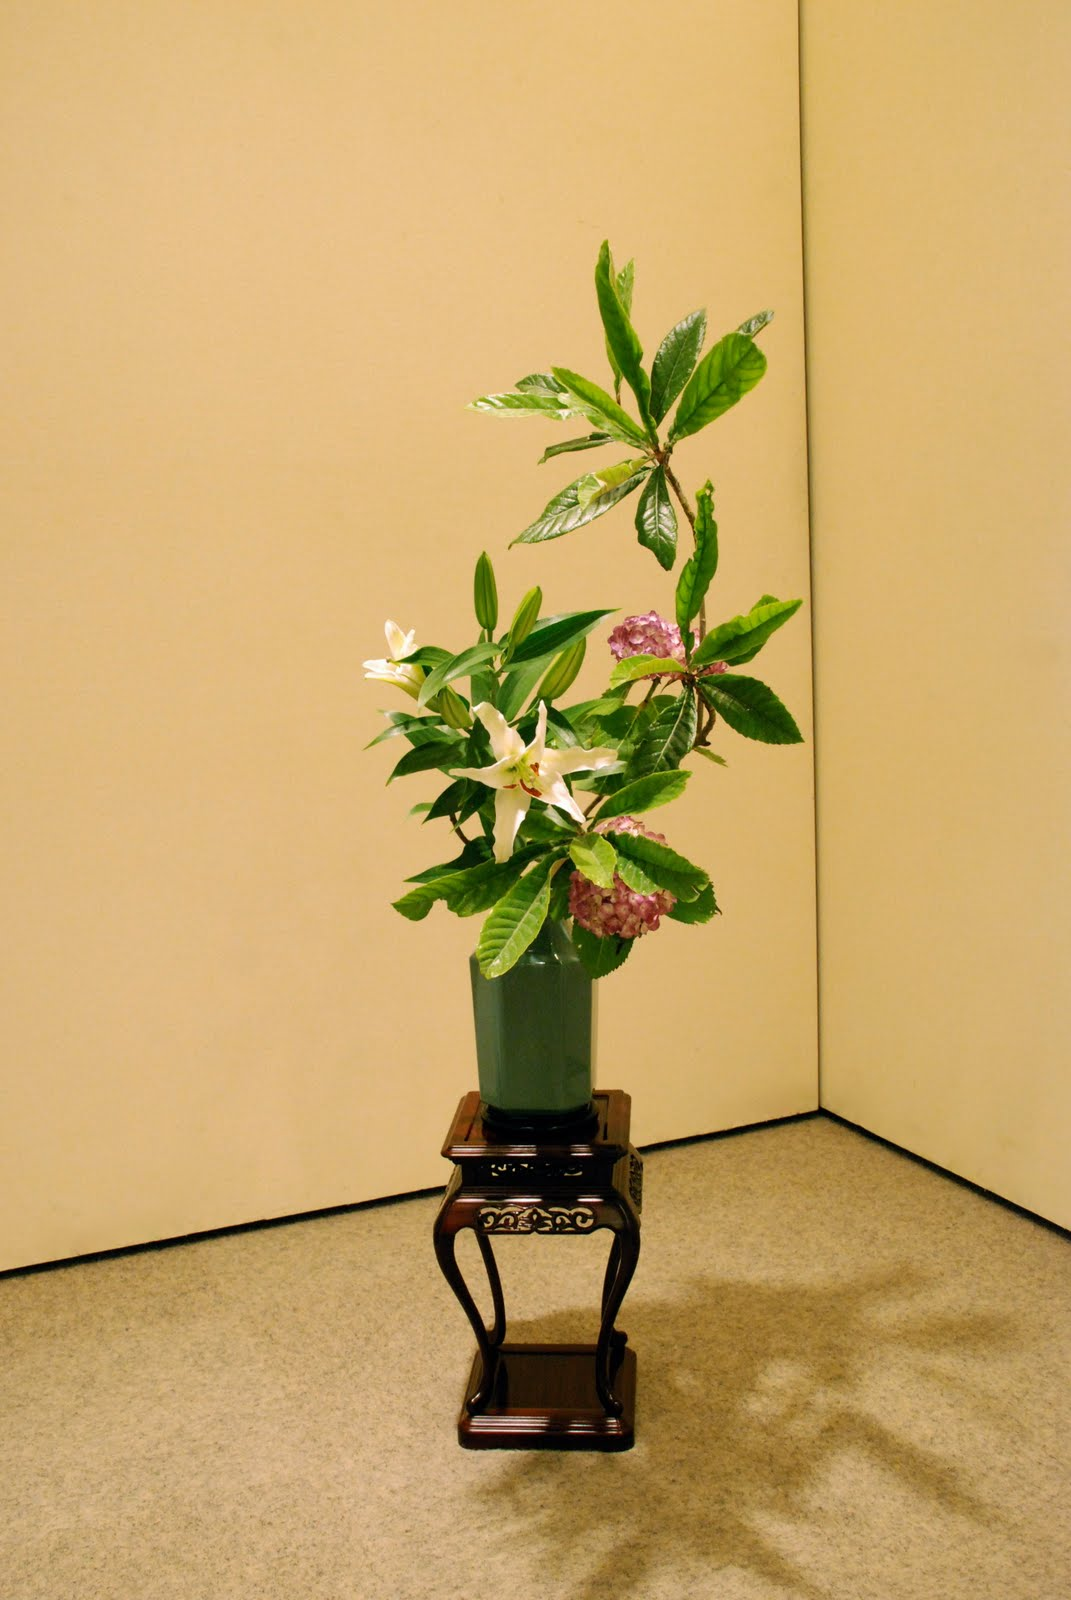 hanamai the ikebana blog 10 Years of Ikebana